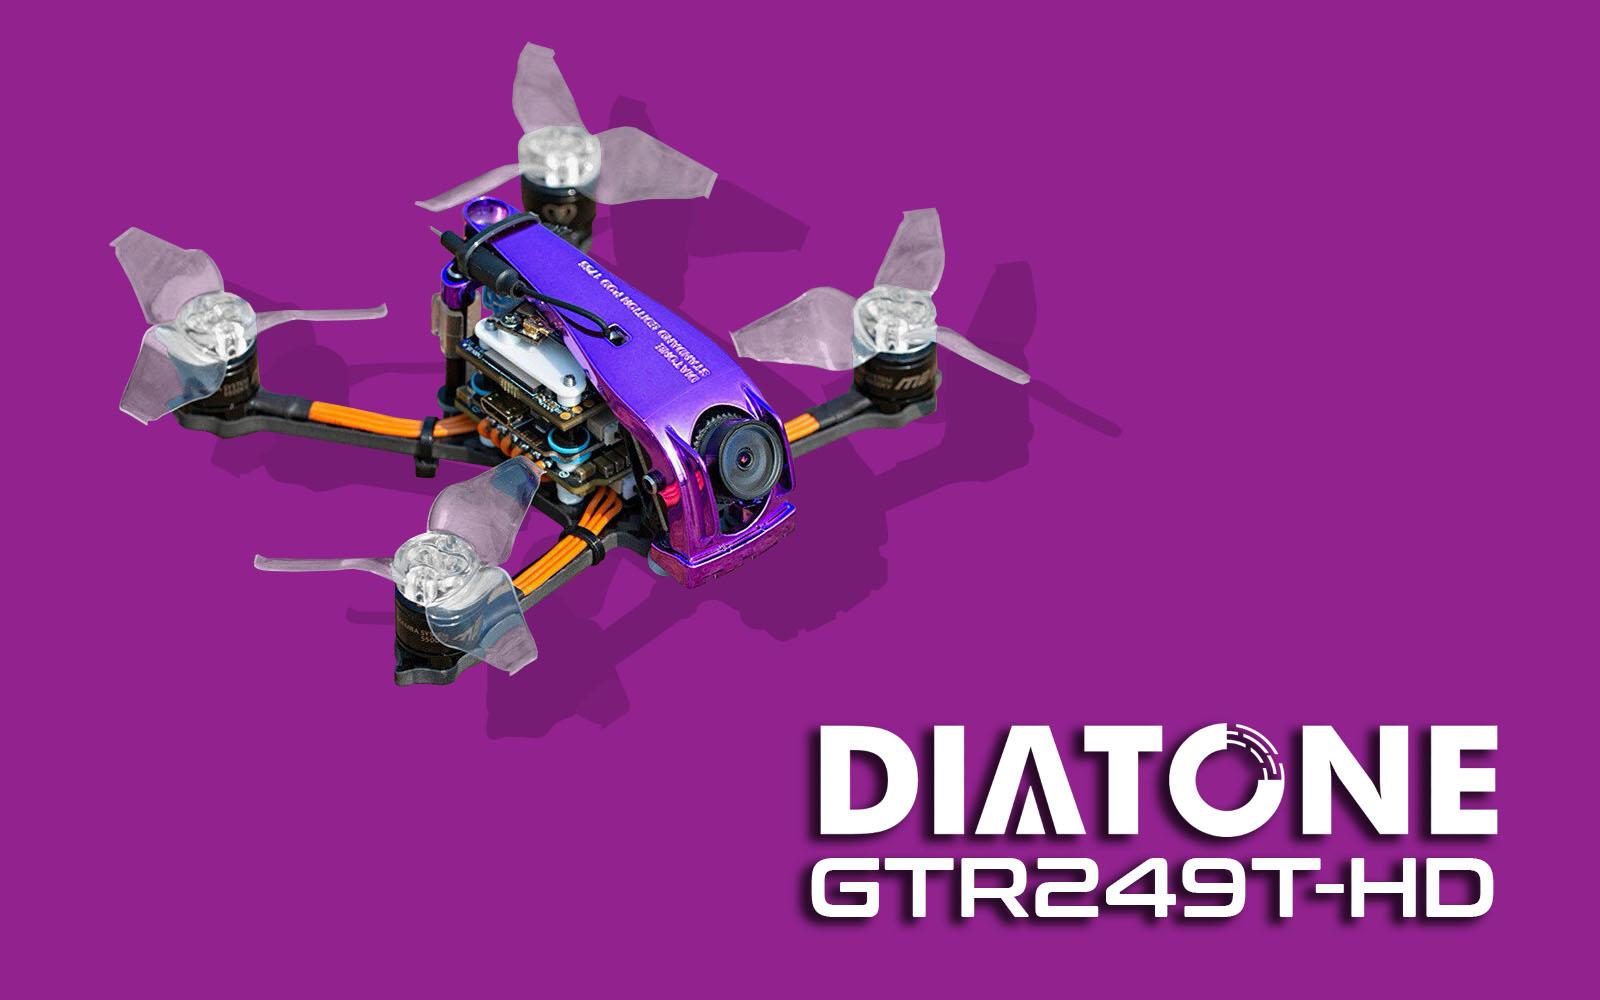 GTR249T-HD DIATONE INNOVATIONS